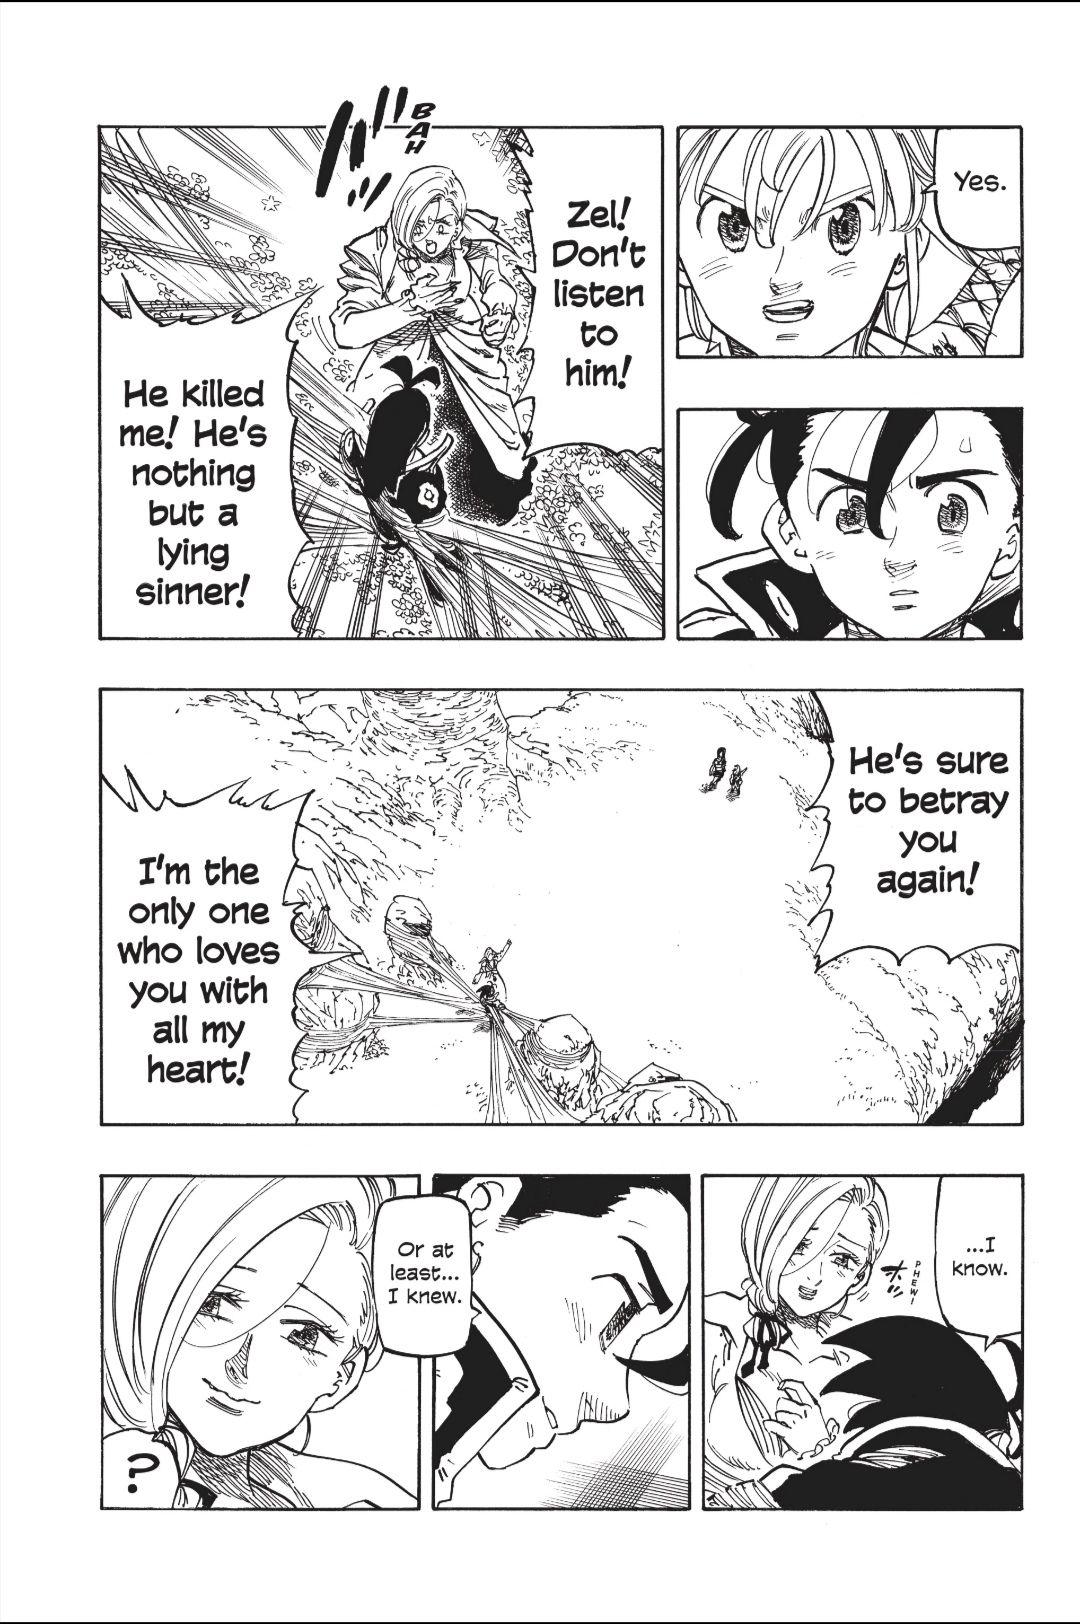 Nanatsu no Taizai Chapter 323 Chapter, Seven deadly sins